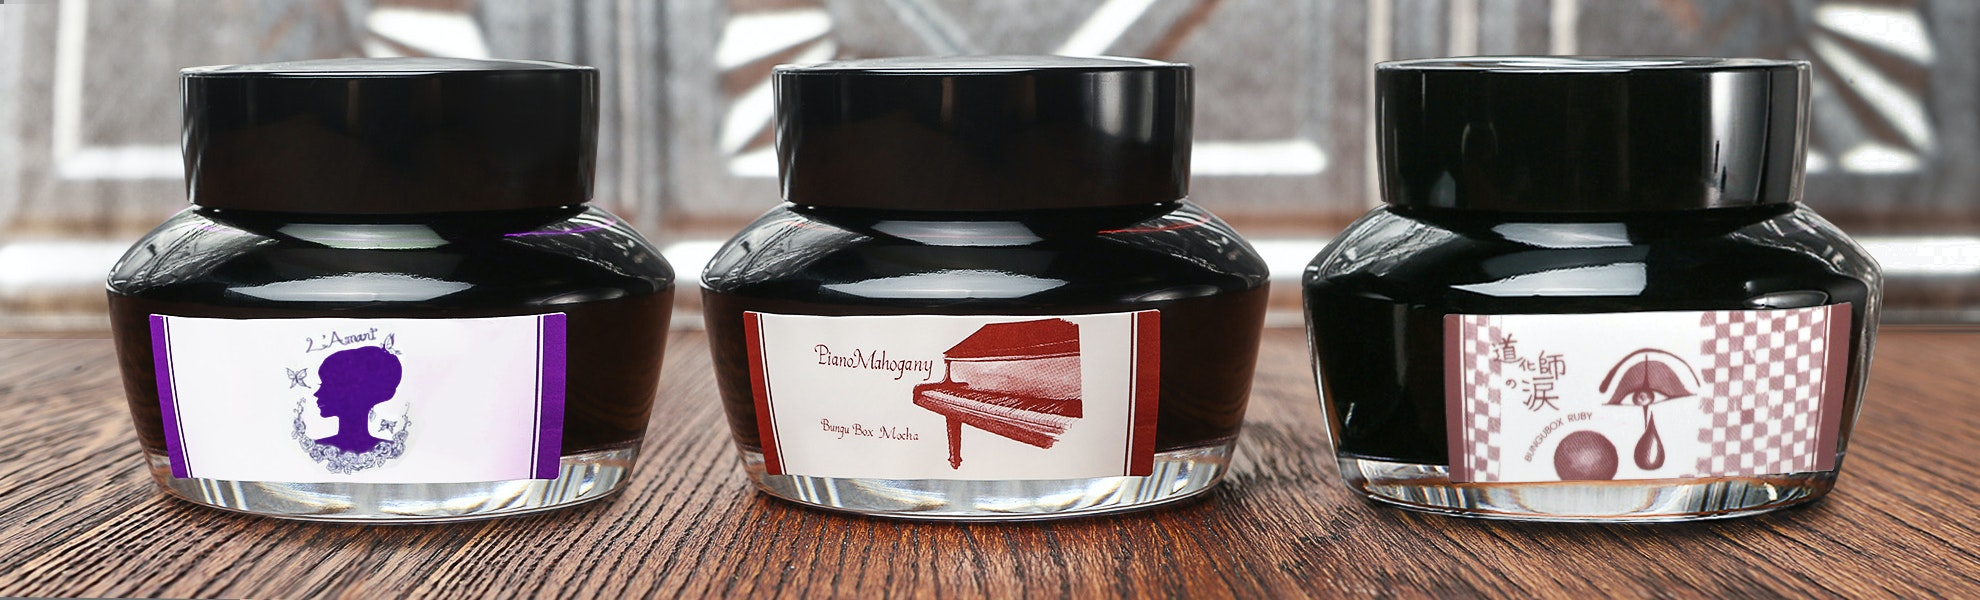 Bungbox Red & Purple Ink Set (3-Pack)